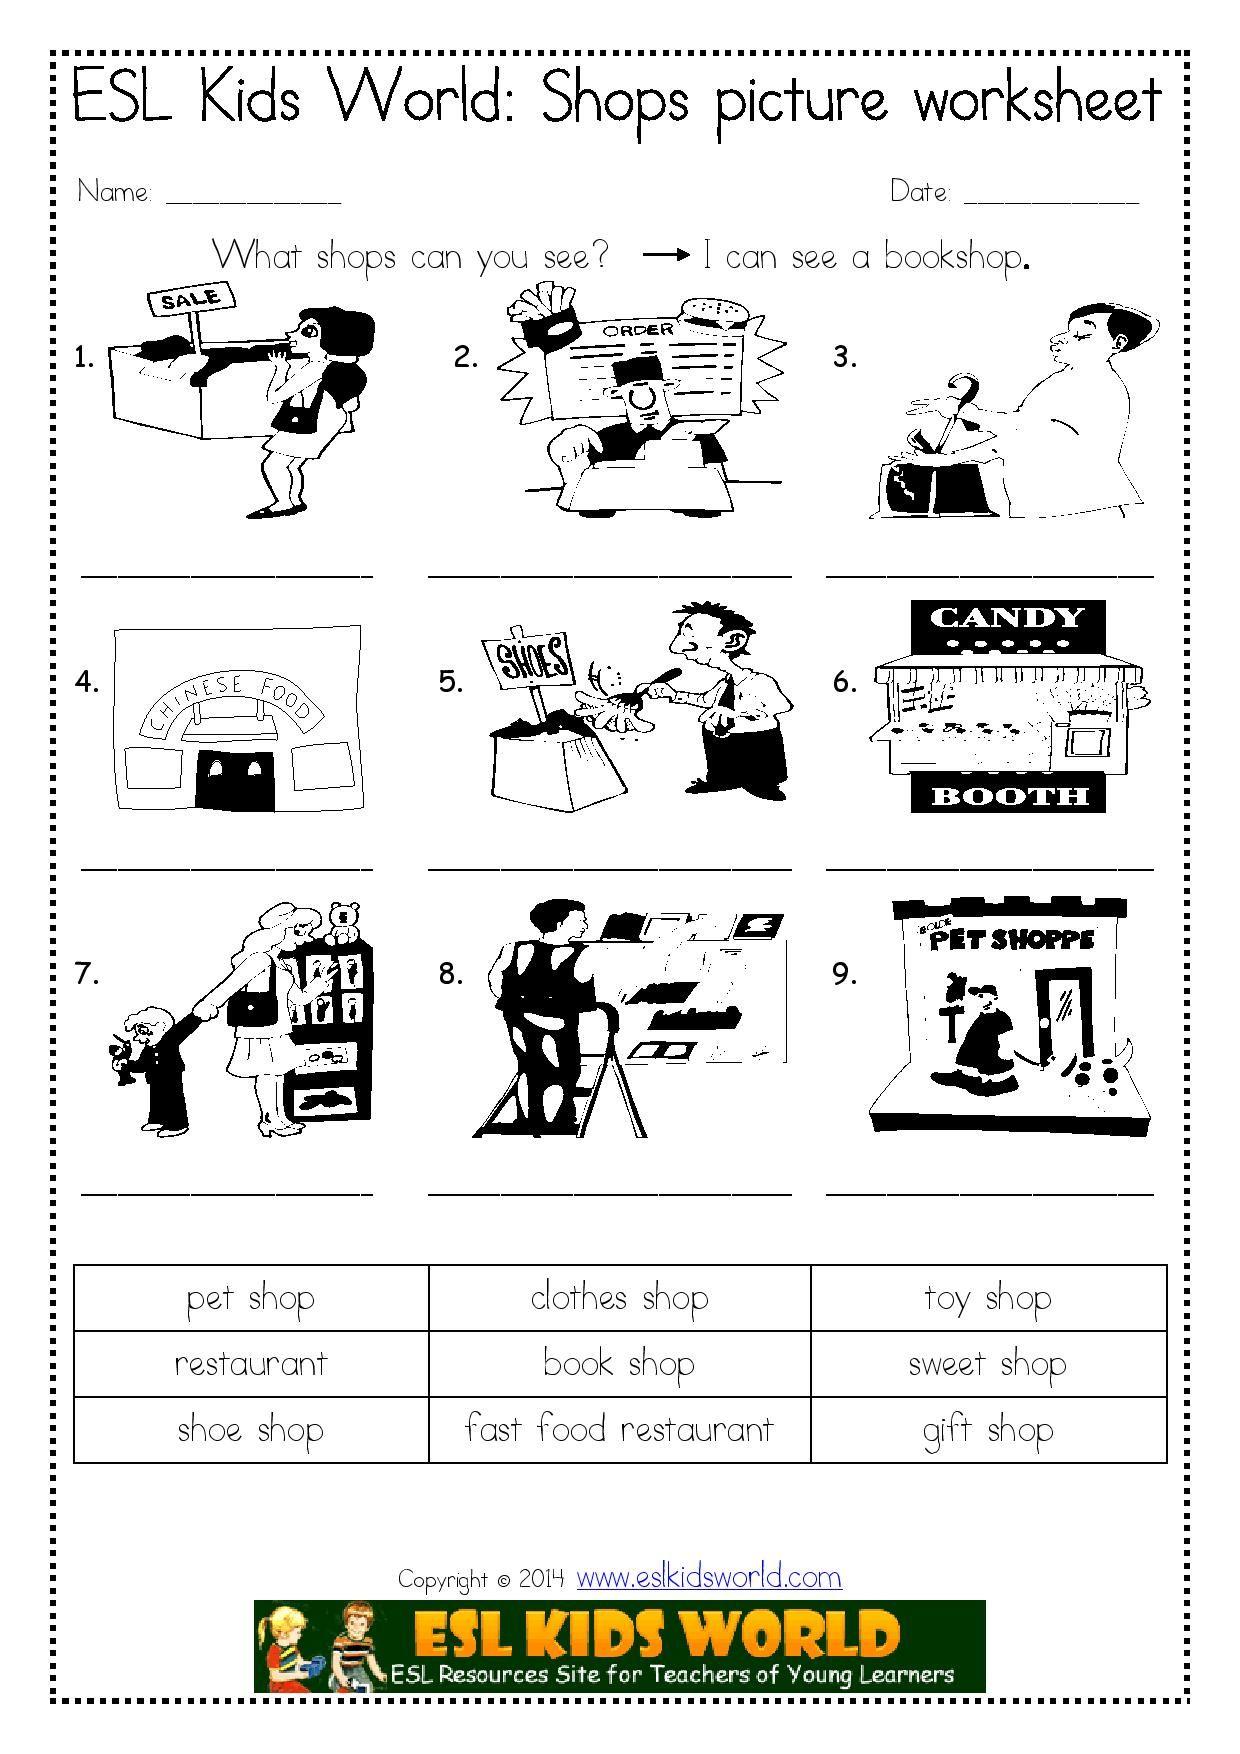 Shops Picture Worksheet Page 001 1 240 1 754 Pixels